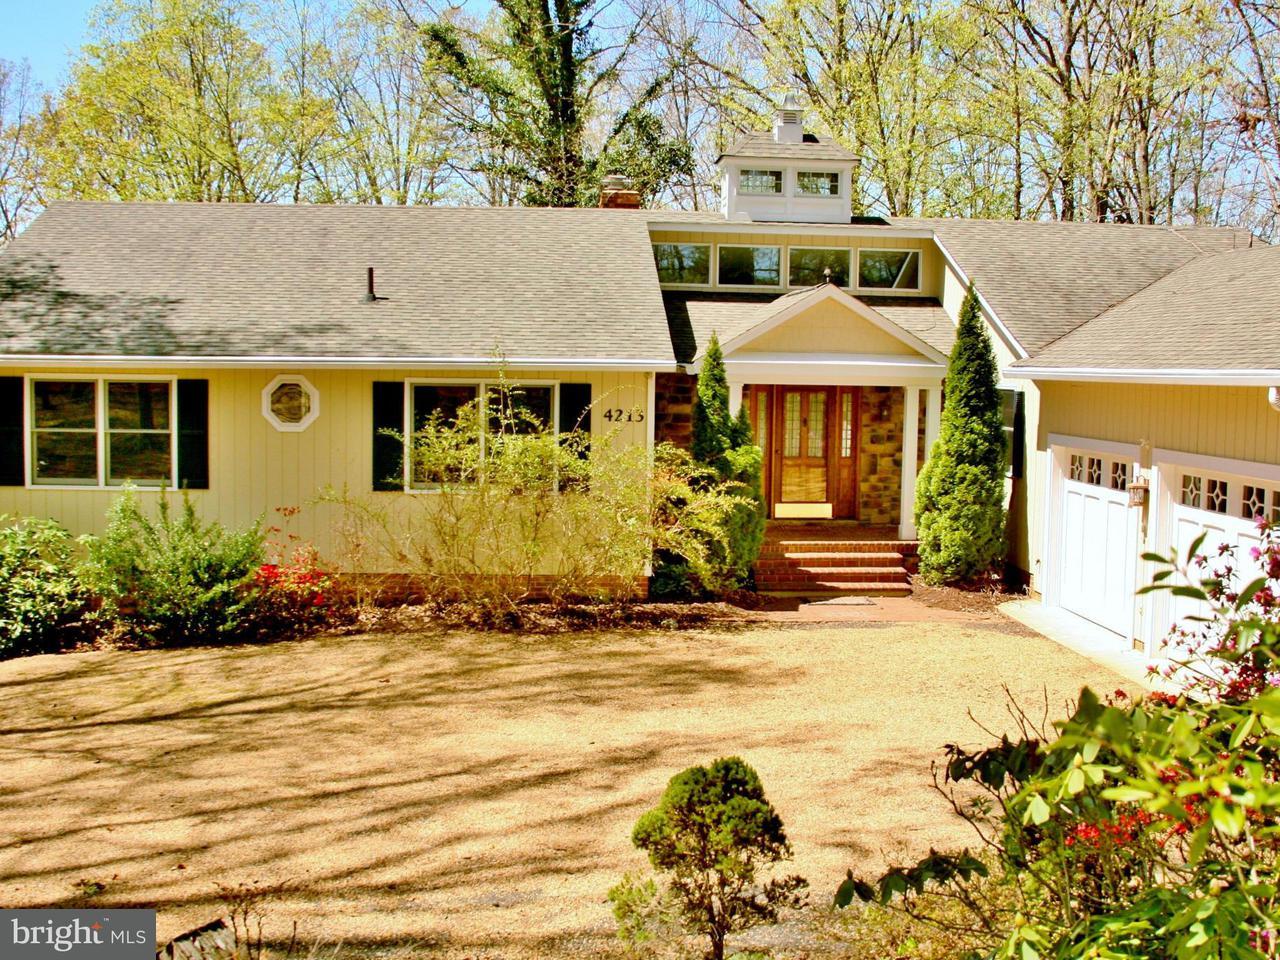 独户住宅 为 销售 在 4213 BOGGS Drive 4213 BOGGS Drive Bumpass, 弗吉尼亚州 23024 美国